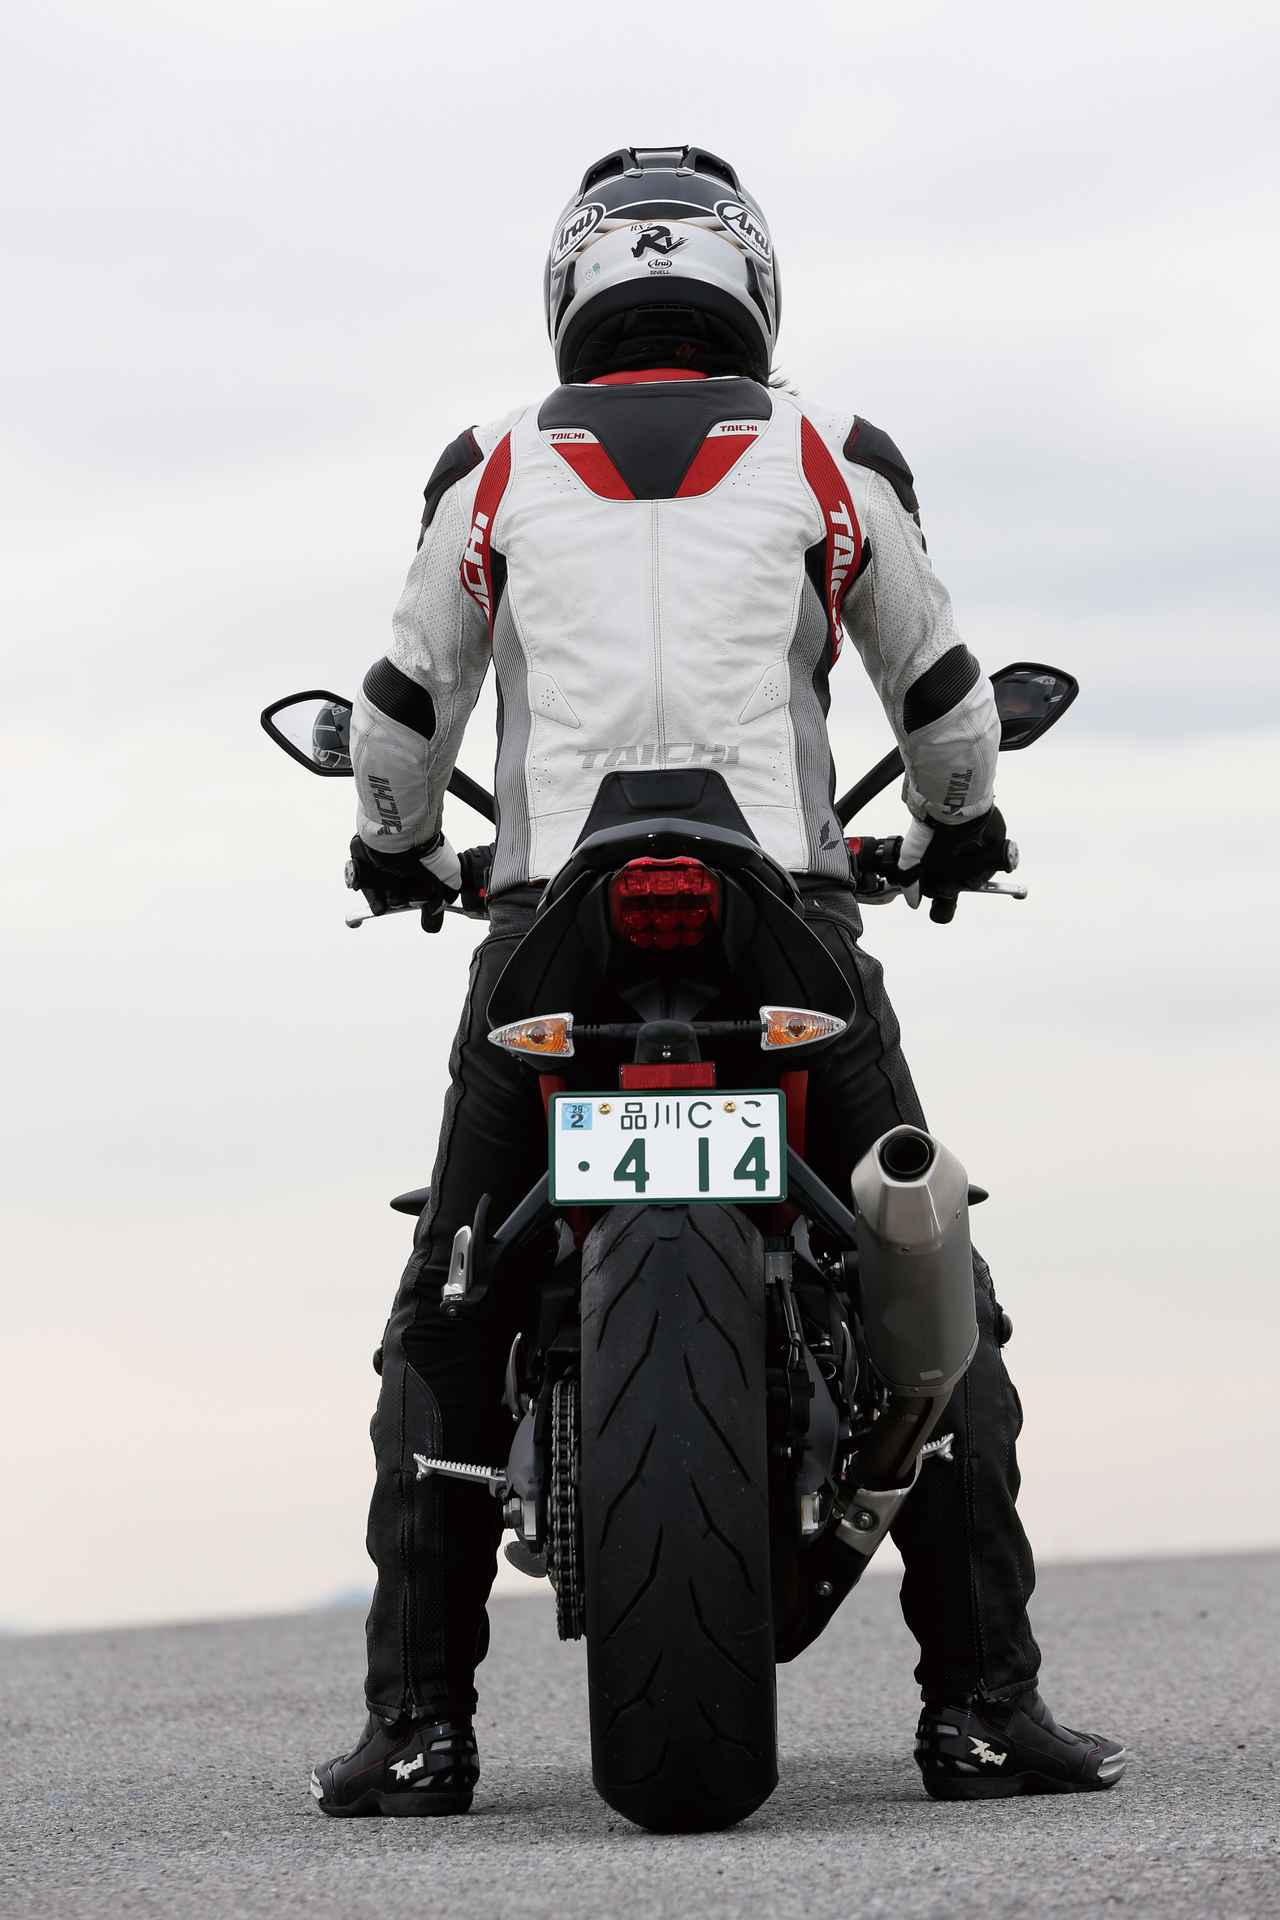 Images : 3番目の画像 - 「キレのいいフットワークが自慢の暴れん坊、日本上陸!『TRIUMPH STREET TRIPLE R』(2014年)」のアルバム - webオートバイ